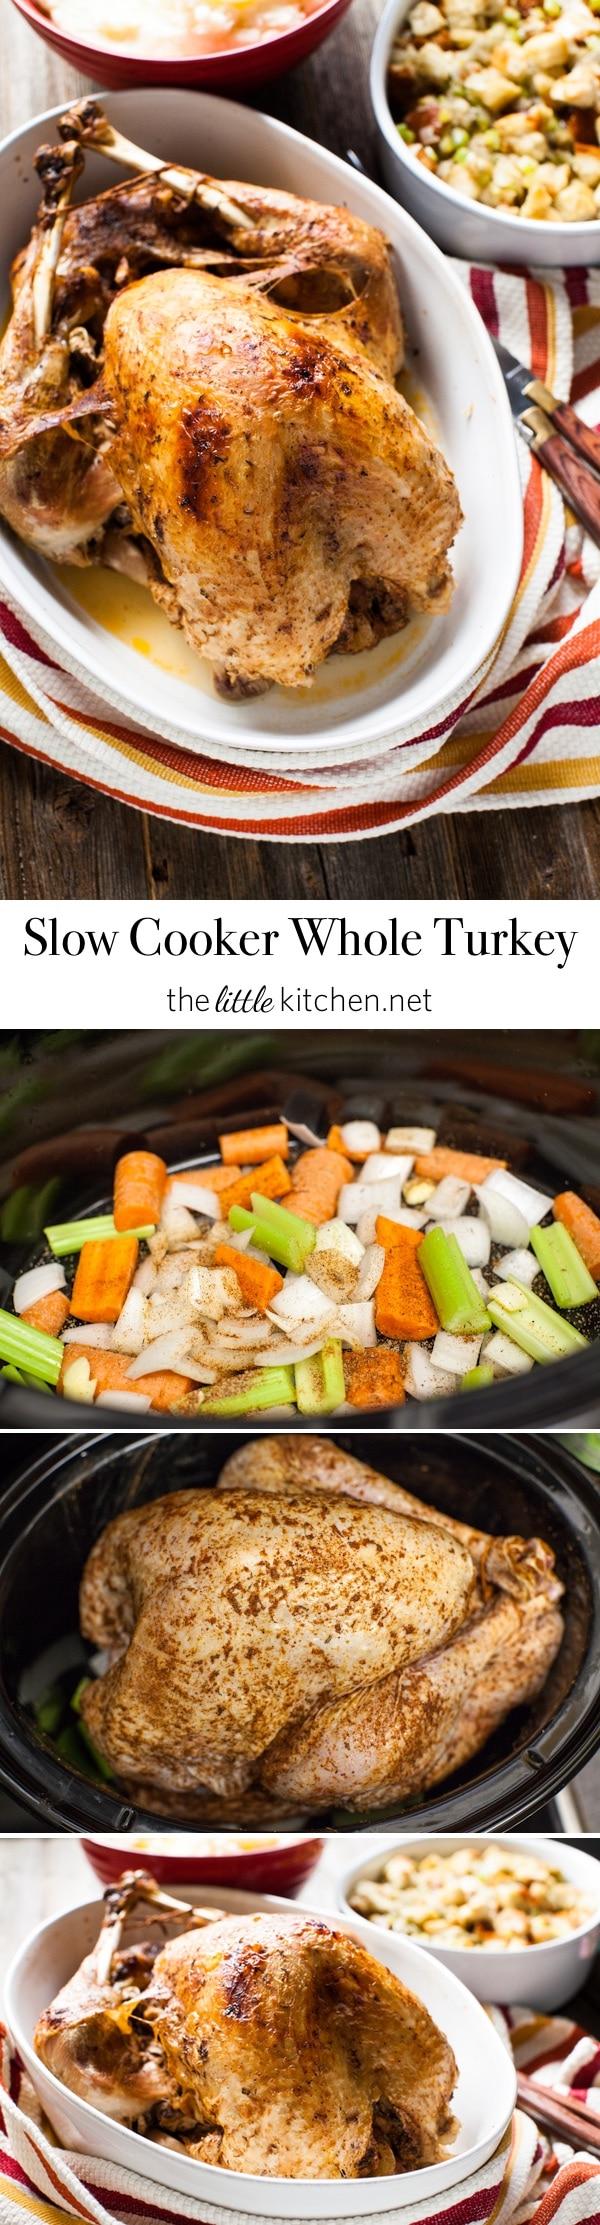 Slow Cooker Whole Turkey from thelittlekitchen.net